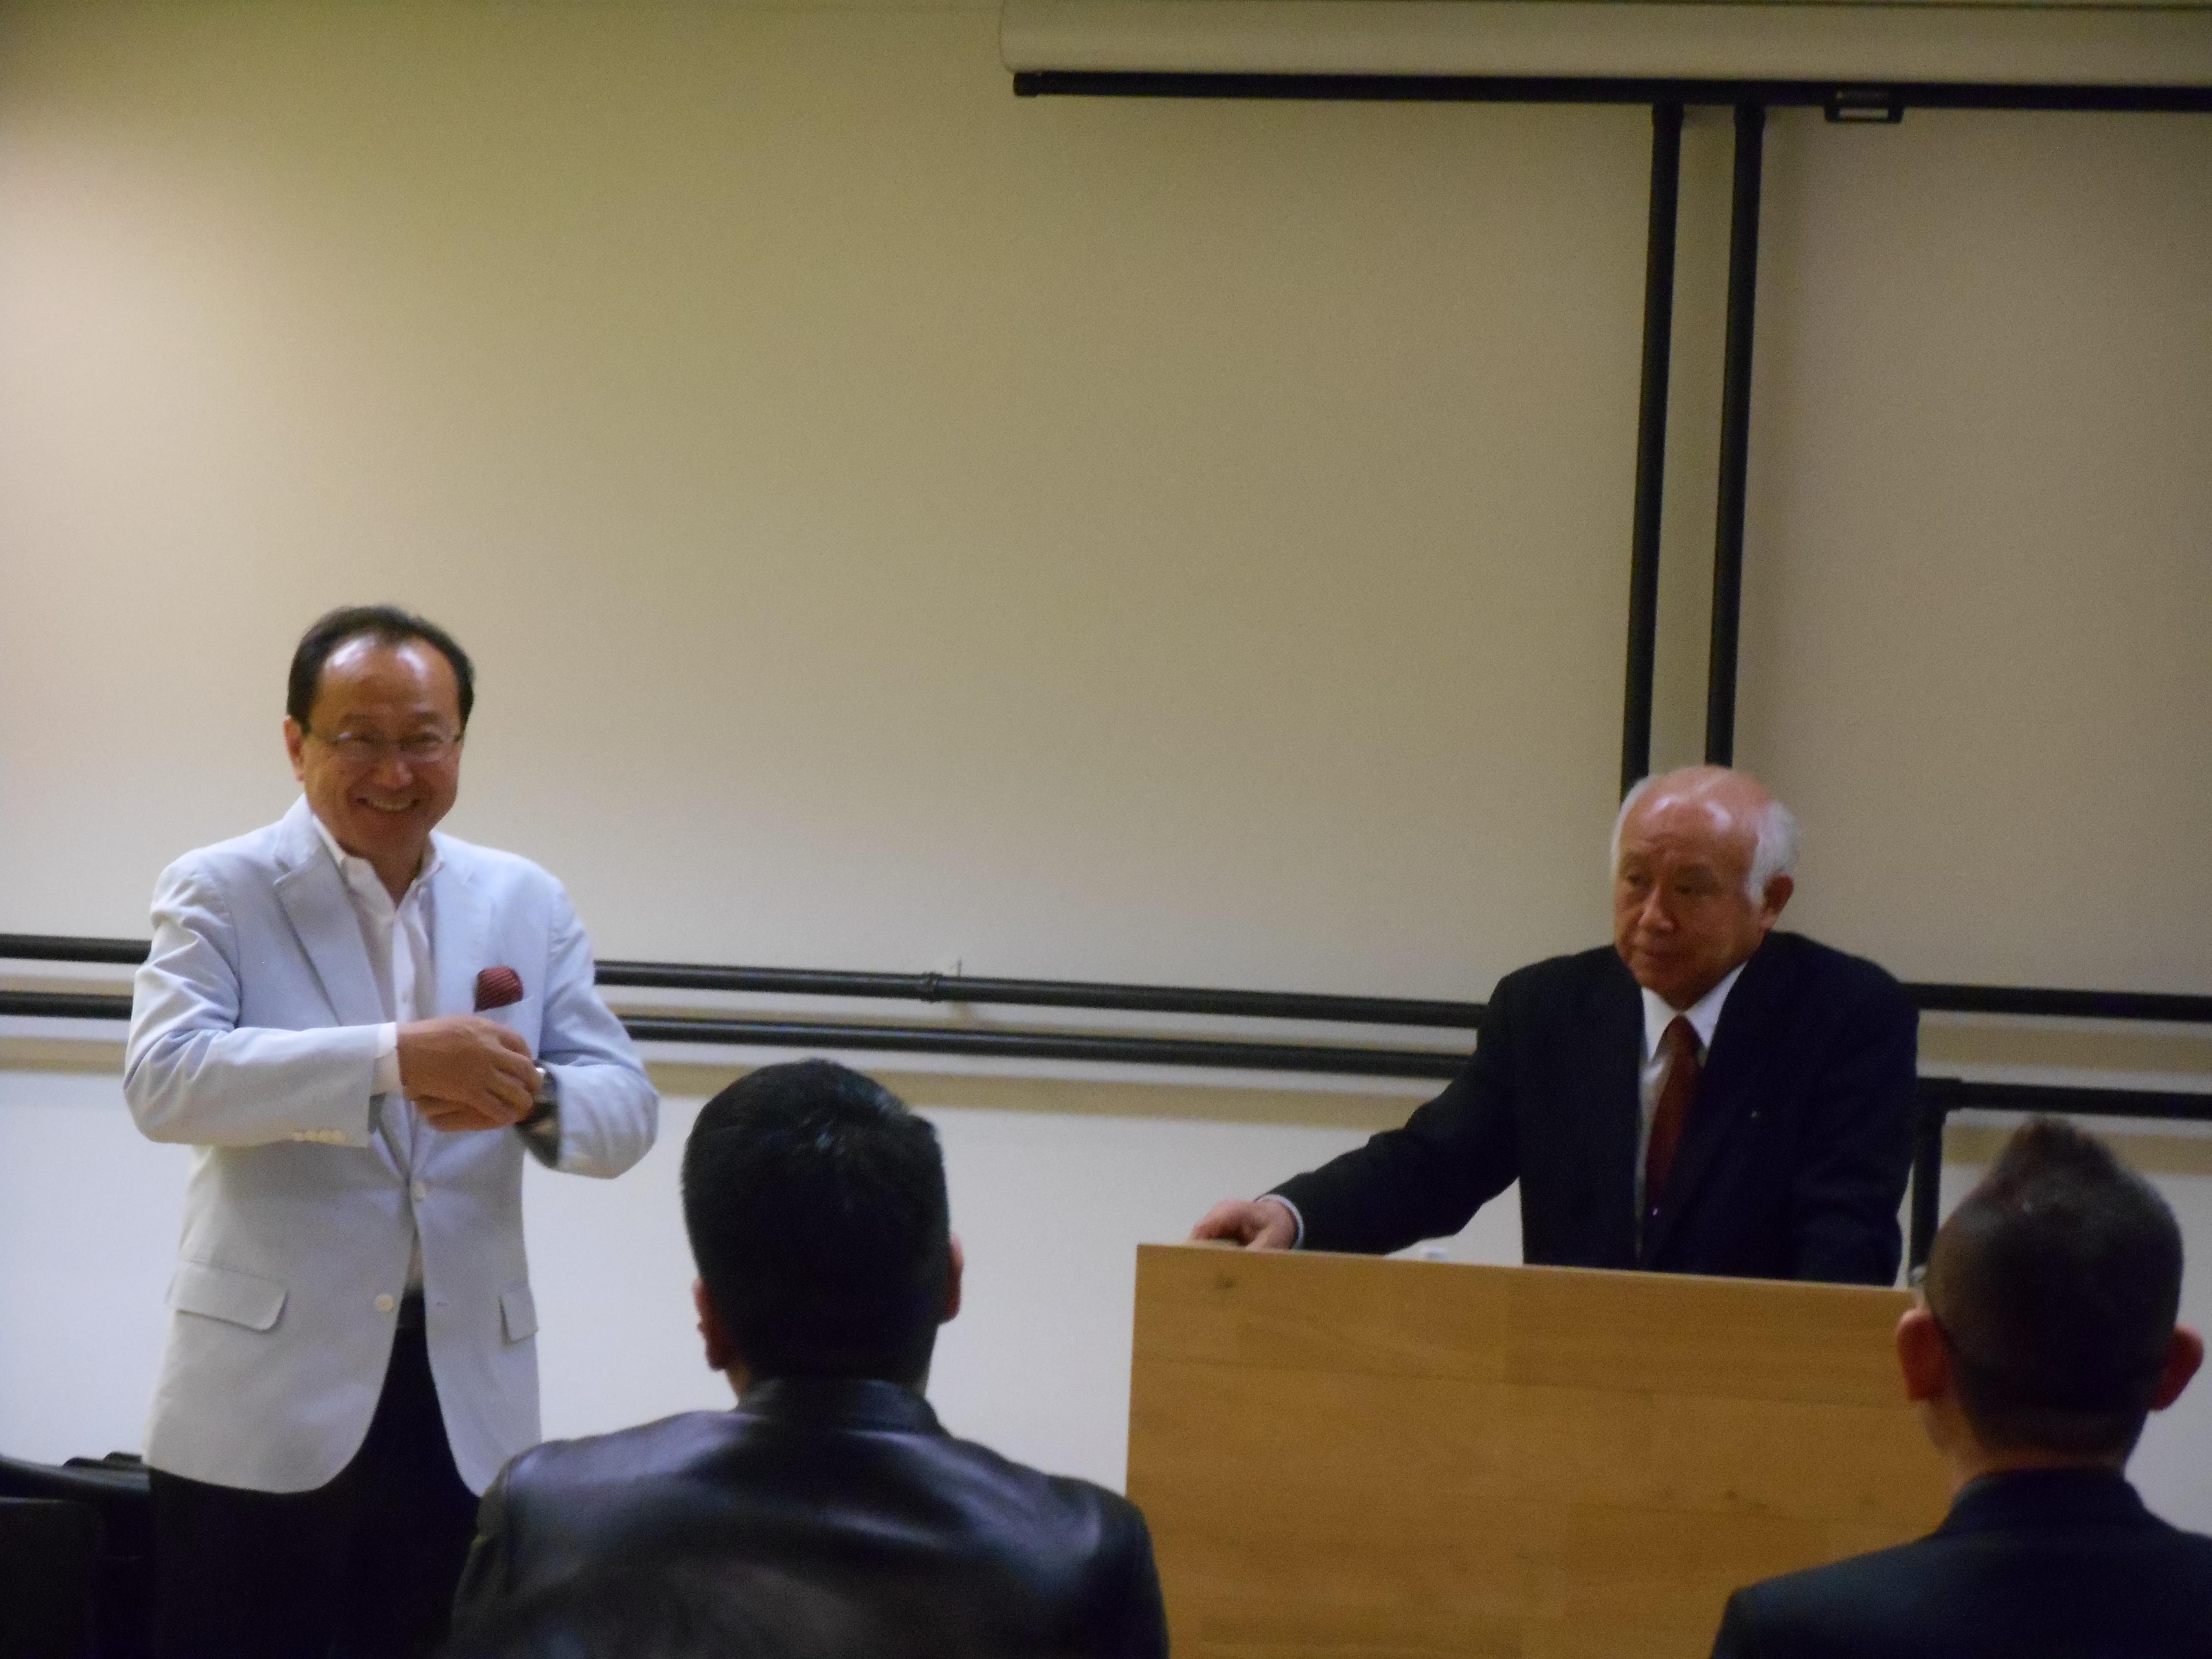 DSCN3734 1 - 4月1日東京思風塾の開催になります。